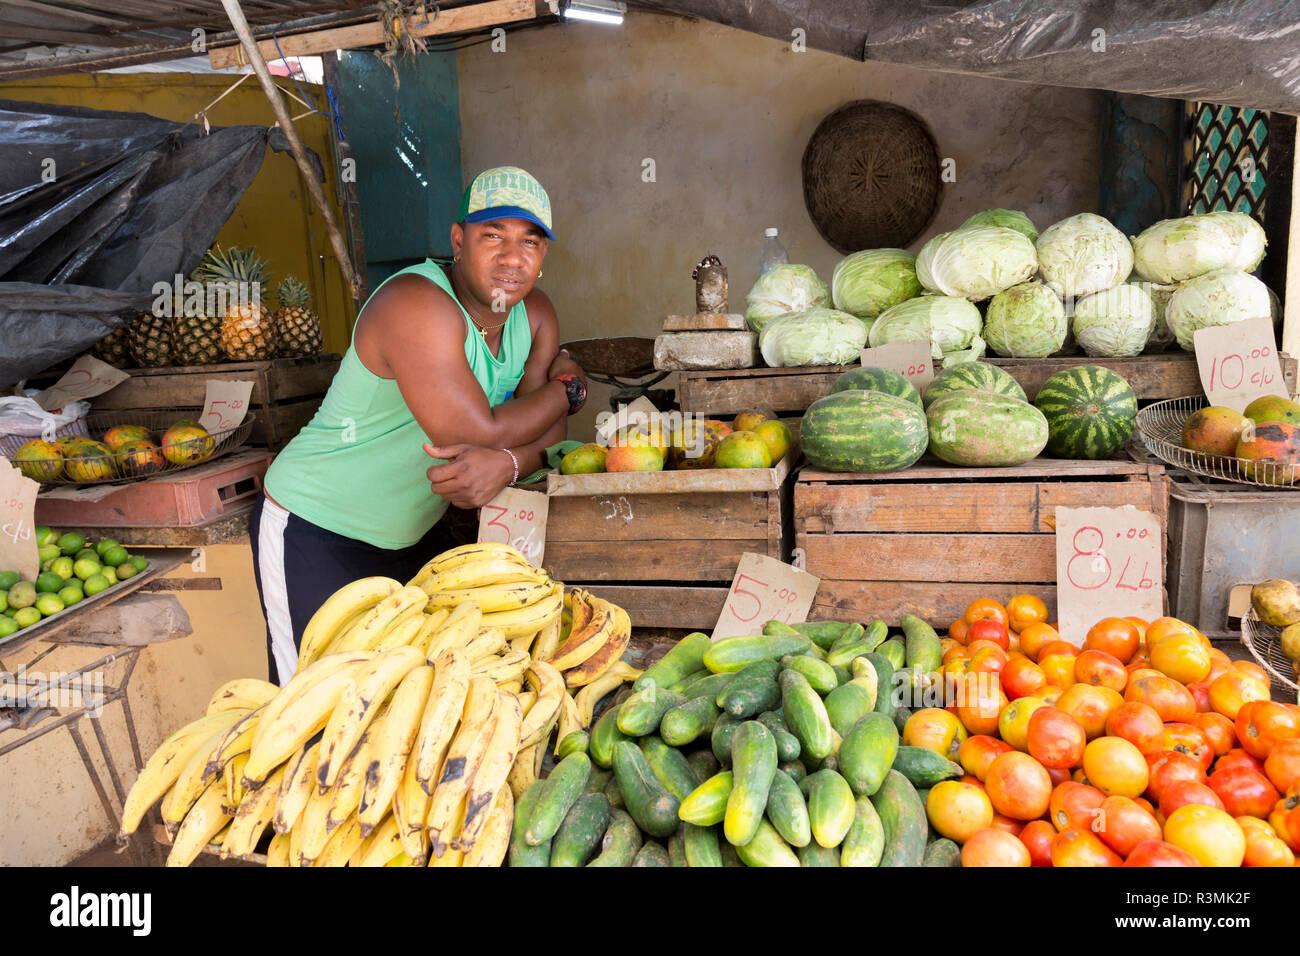 Cuba, Havana. Produce vendor. Credit as: Wendy Kaveney / Jaynes Gallery / DanitaDelimont.com Stock Photo